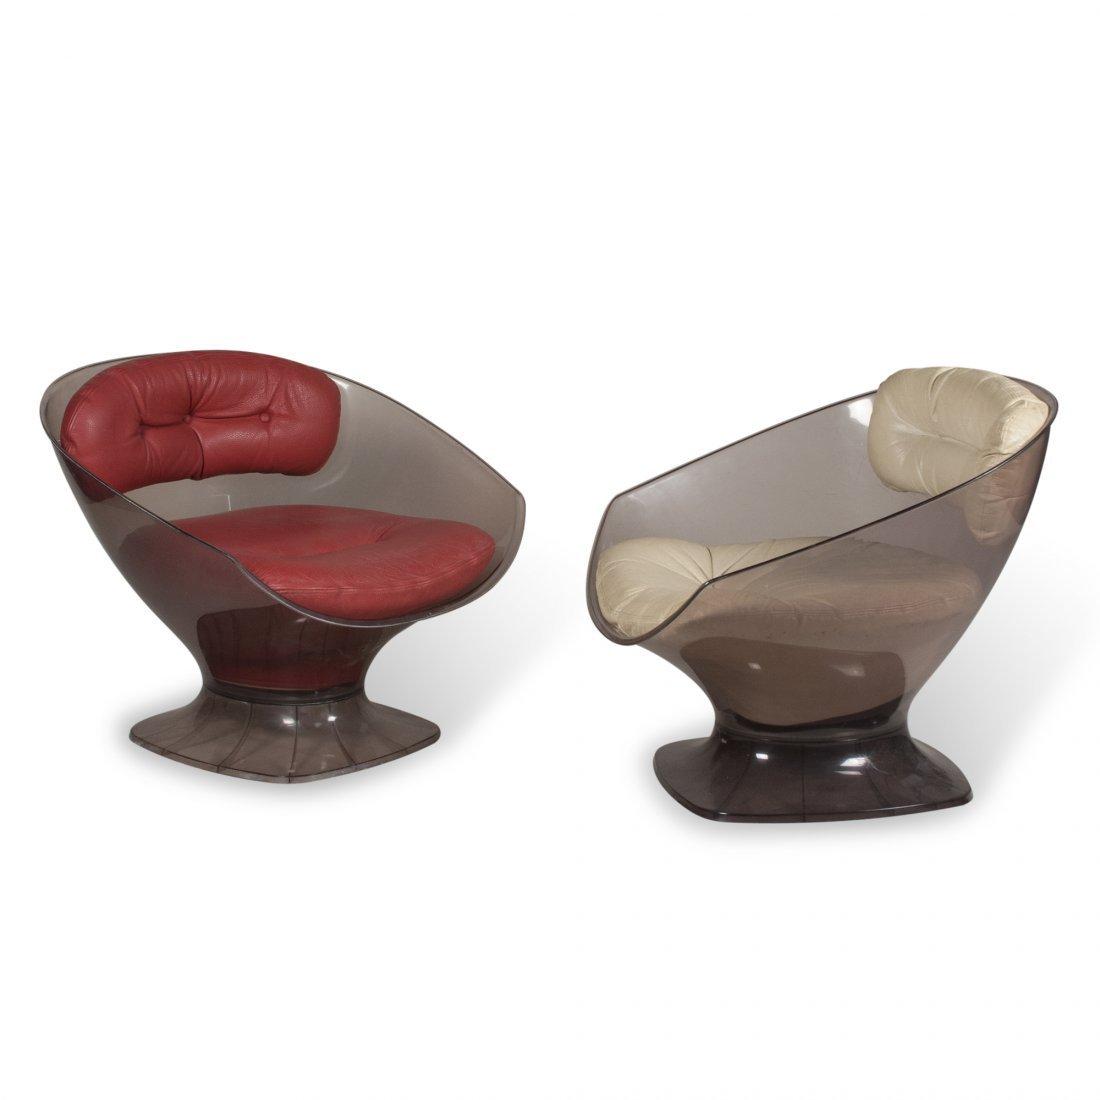 Smoky Plexi Chairs by Raphael